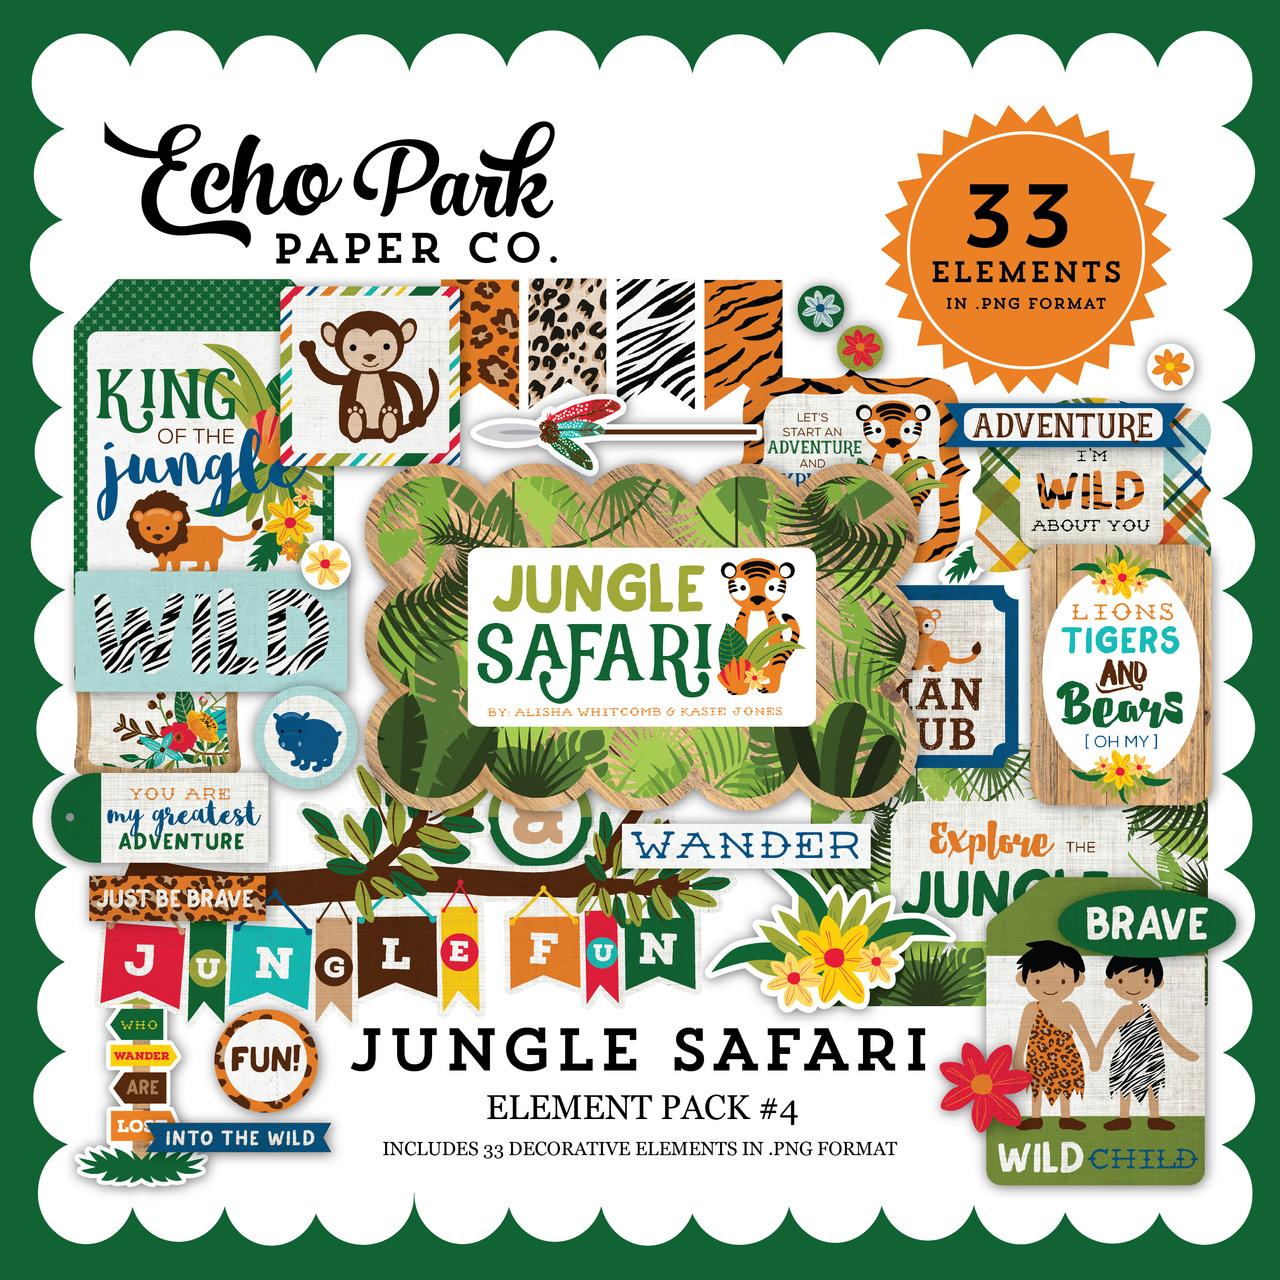 Jungle Safari Element Pack #4